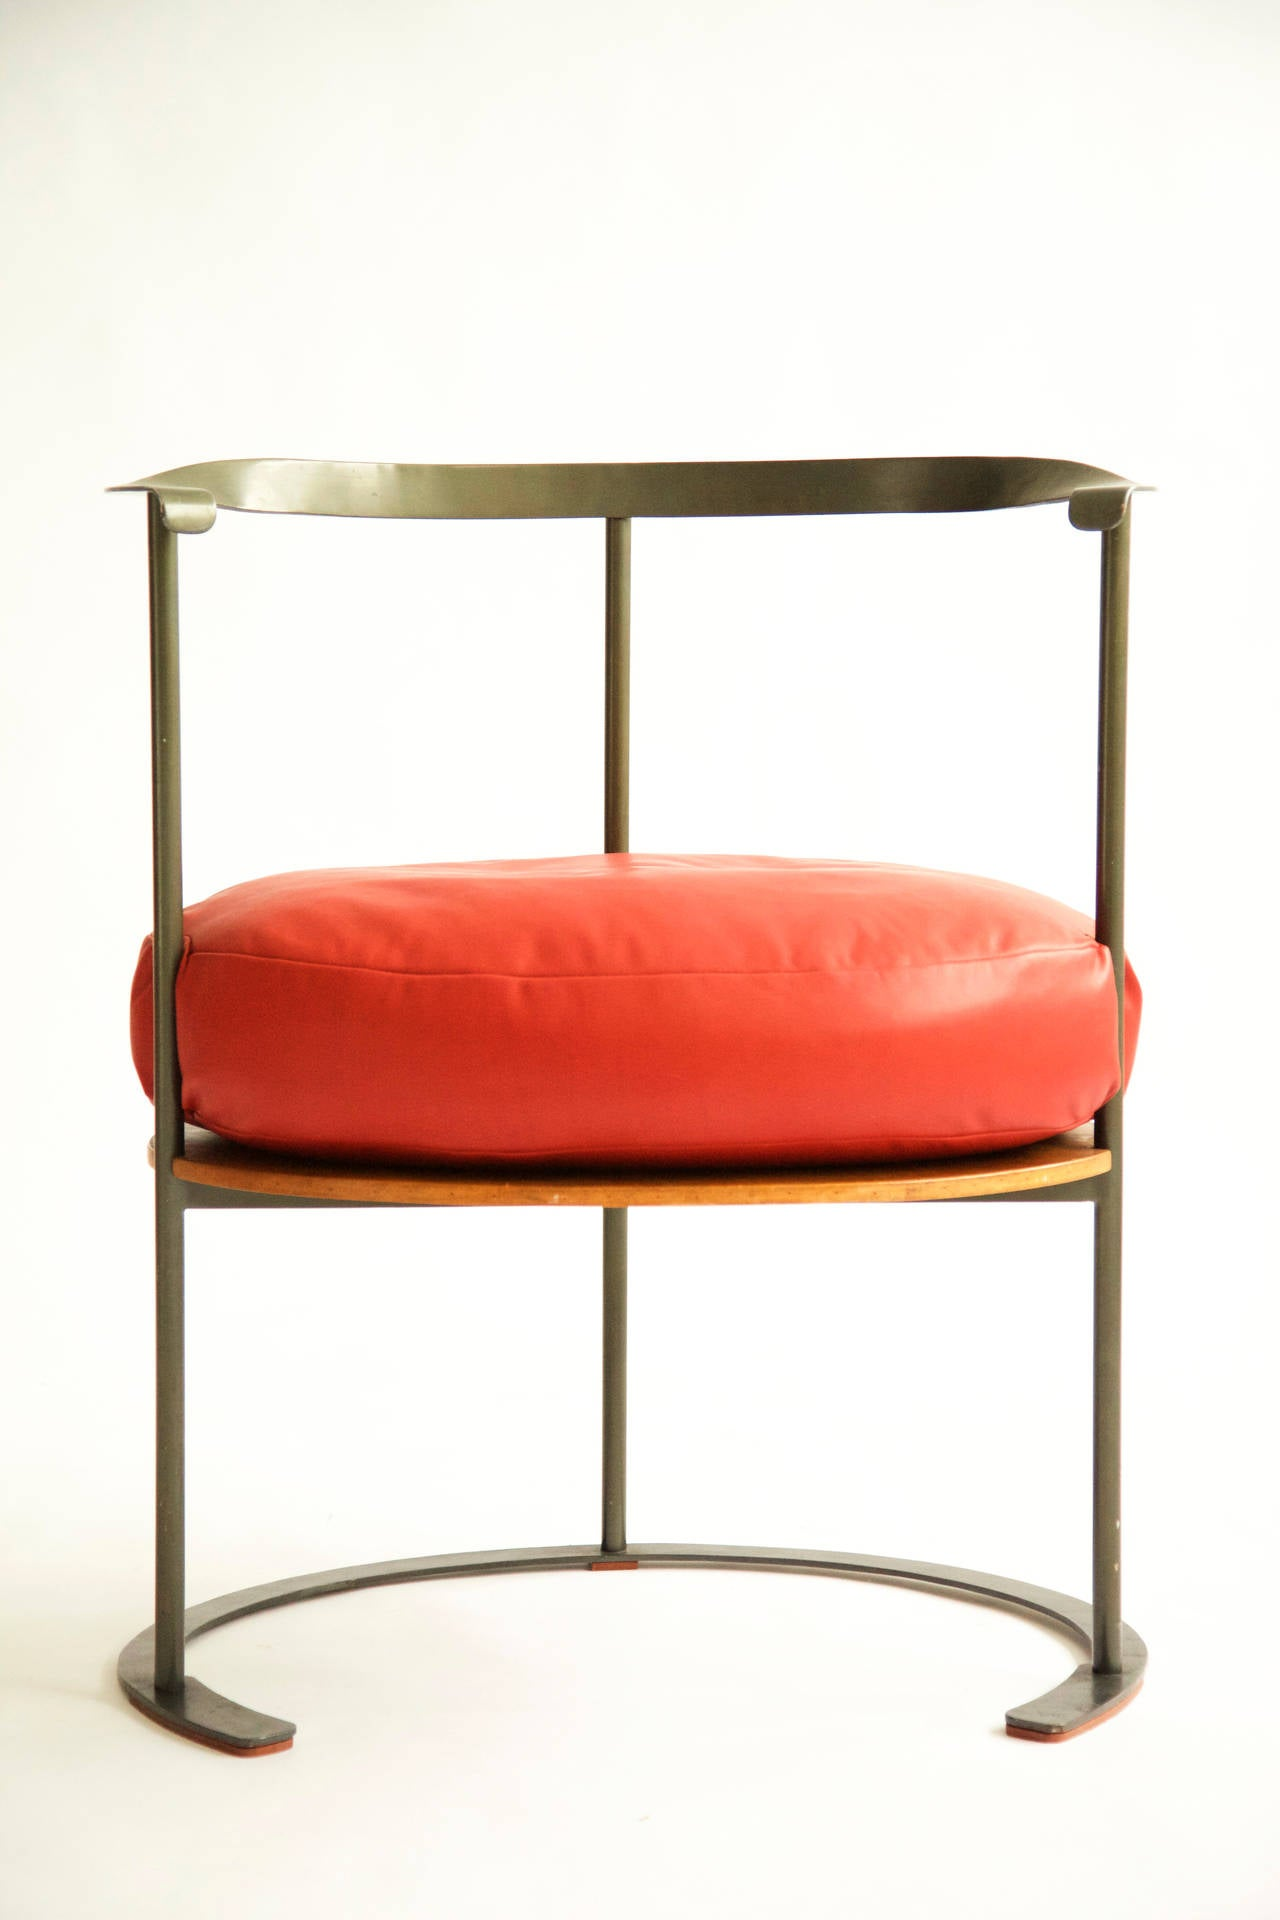 Luigi Caccia Dominioni Poltrona Catilina Armchair For Sale at 1stdibs